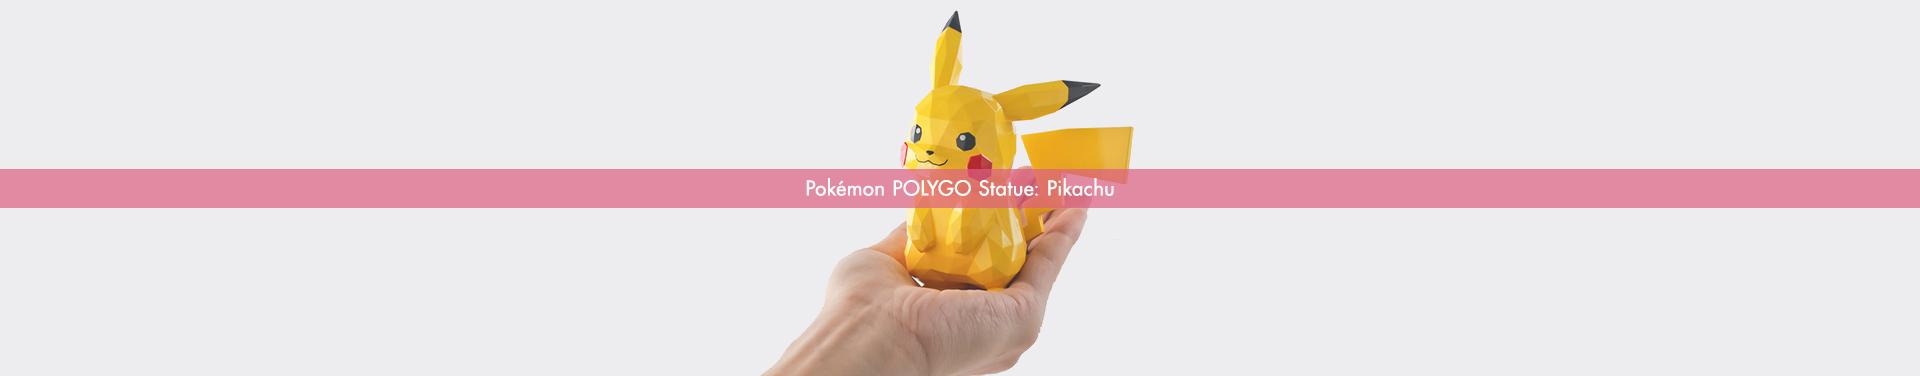 Pokémon POLYGO Statue: Pikachu